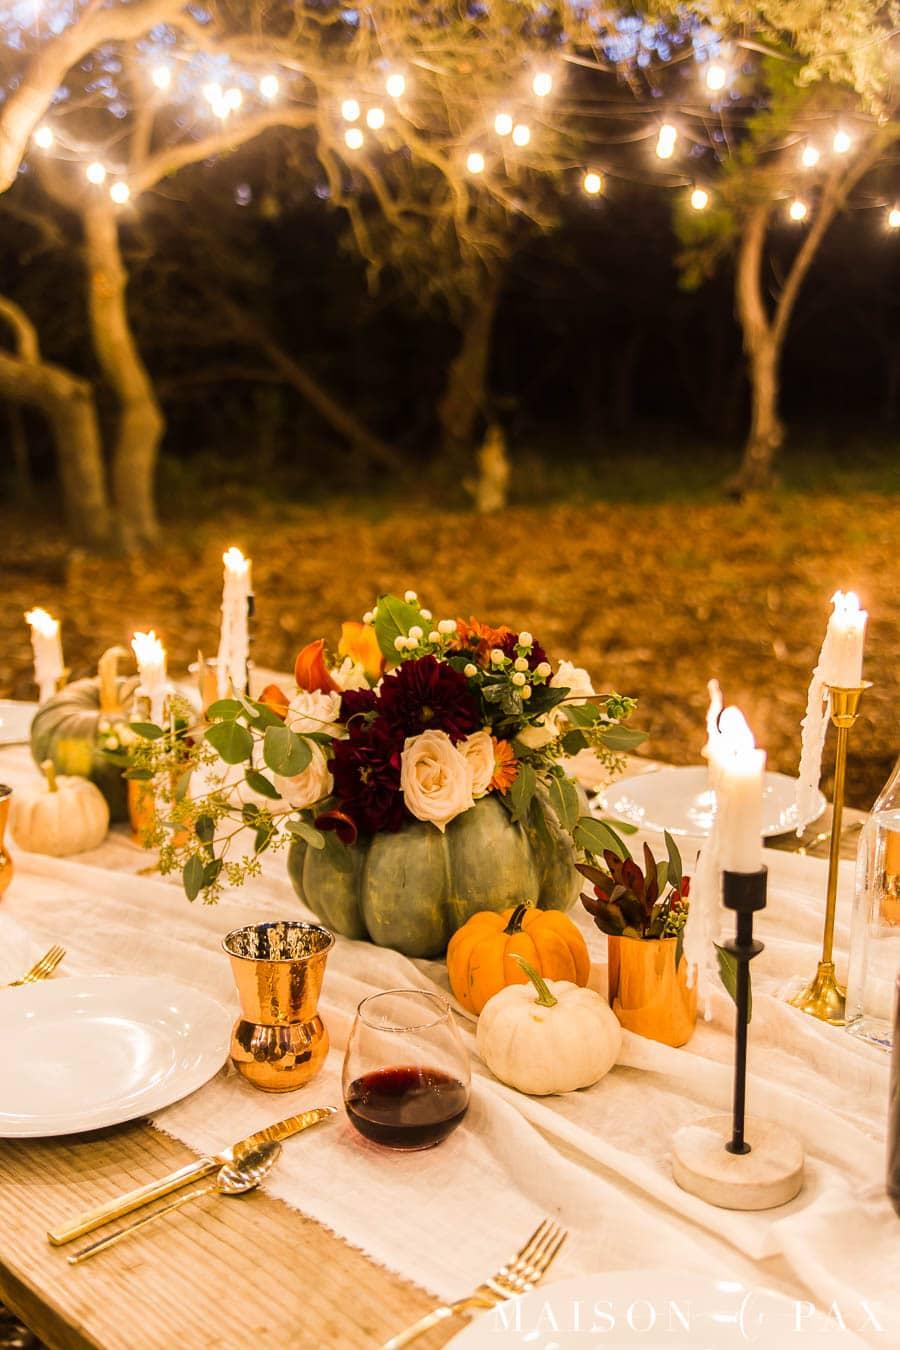 night time outdoor Thanksgiving table | Maison de Pax